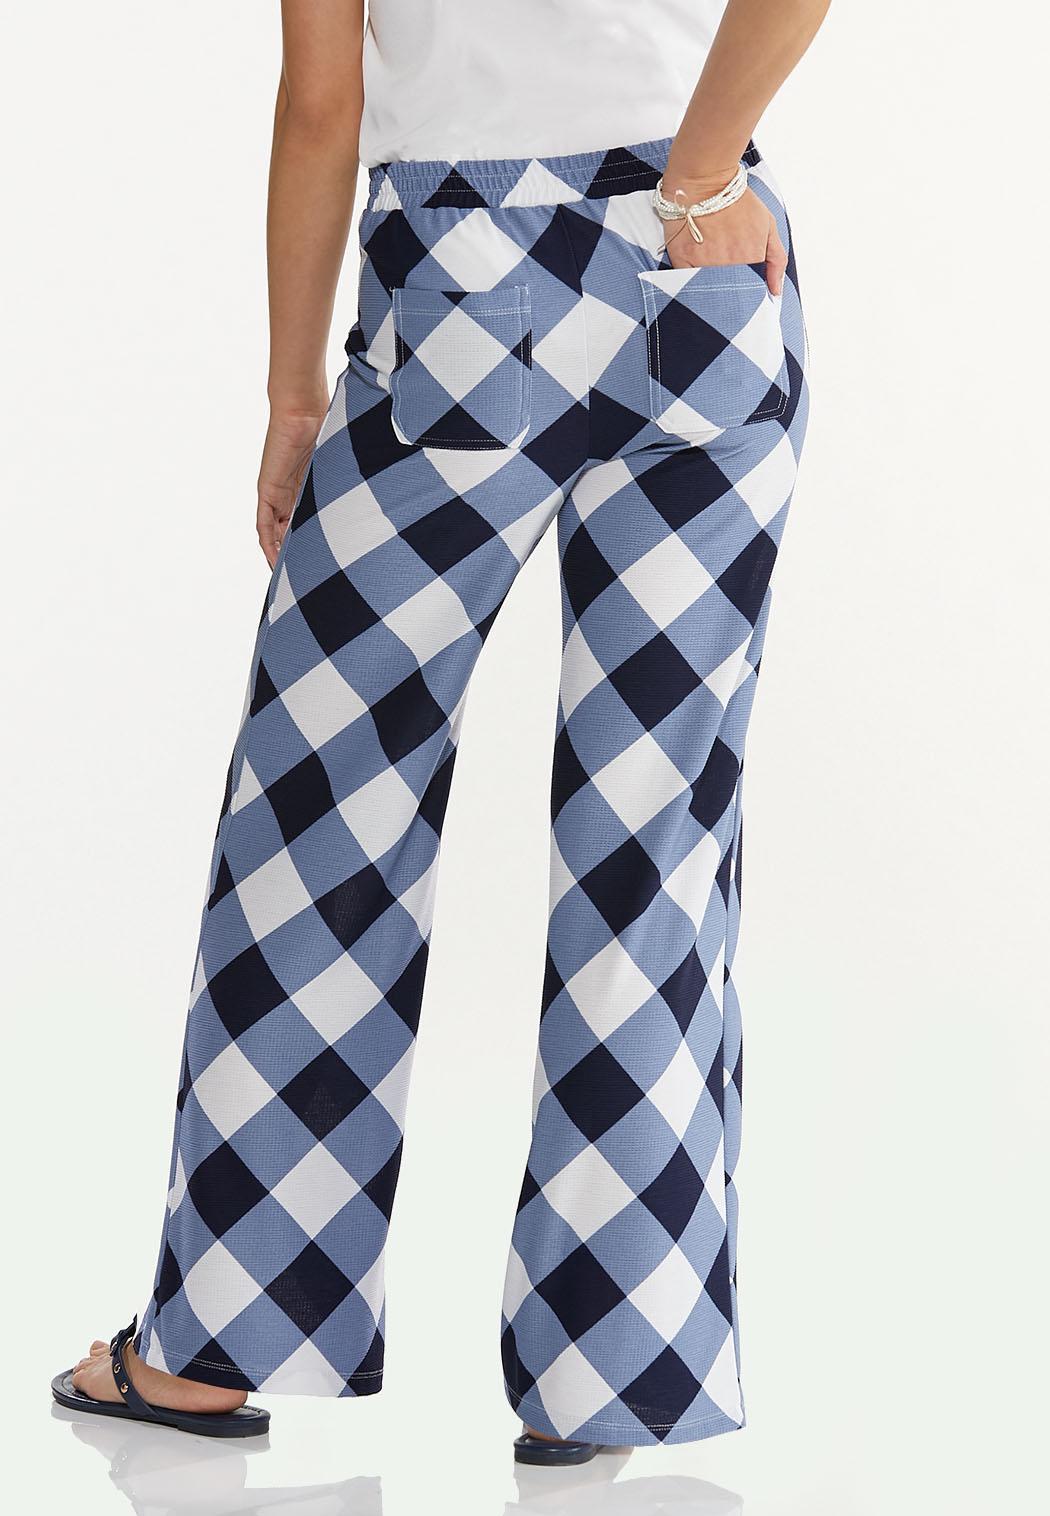 Petite Navy Gingham Pants (Item #44610626)